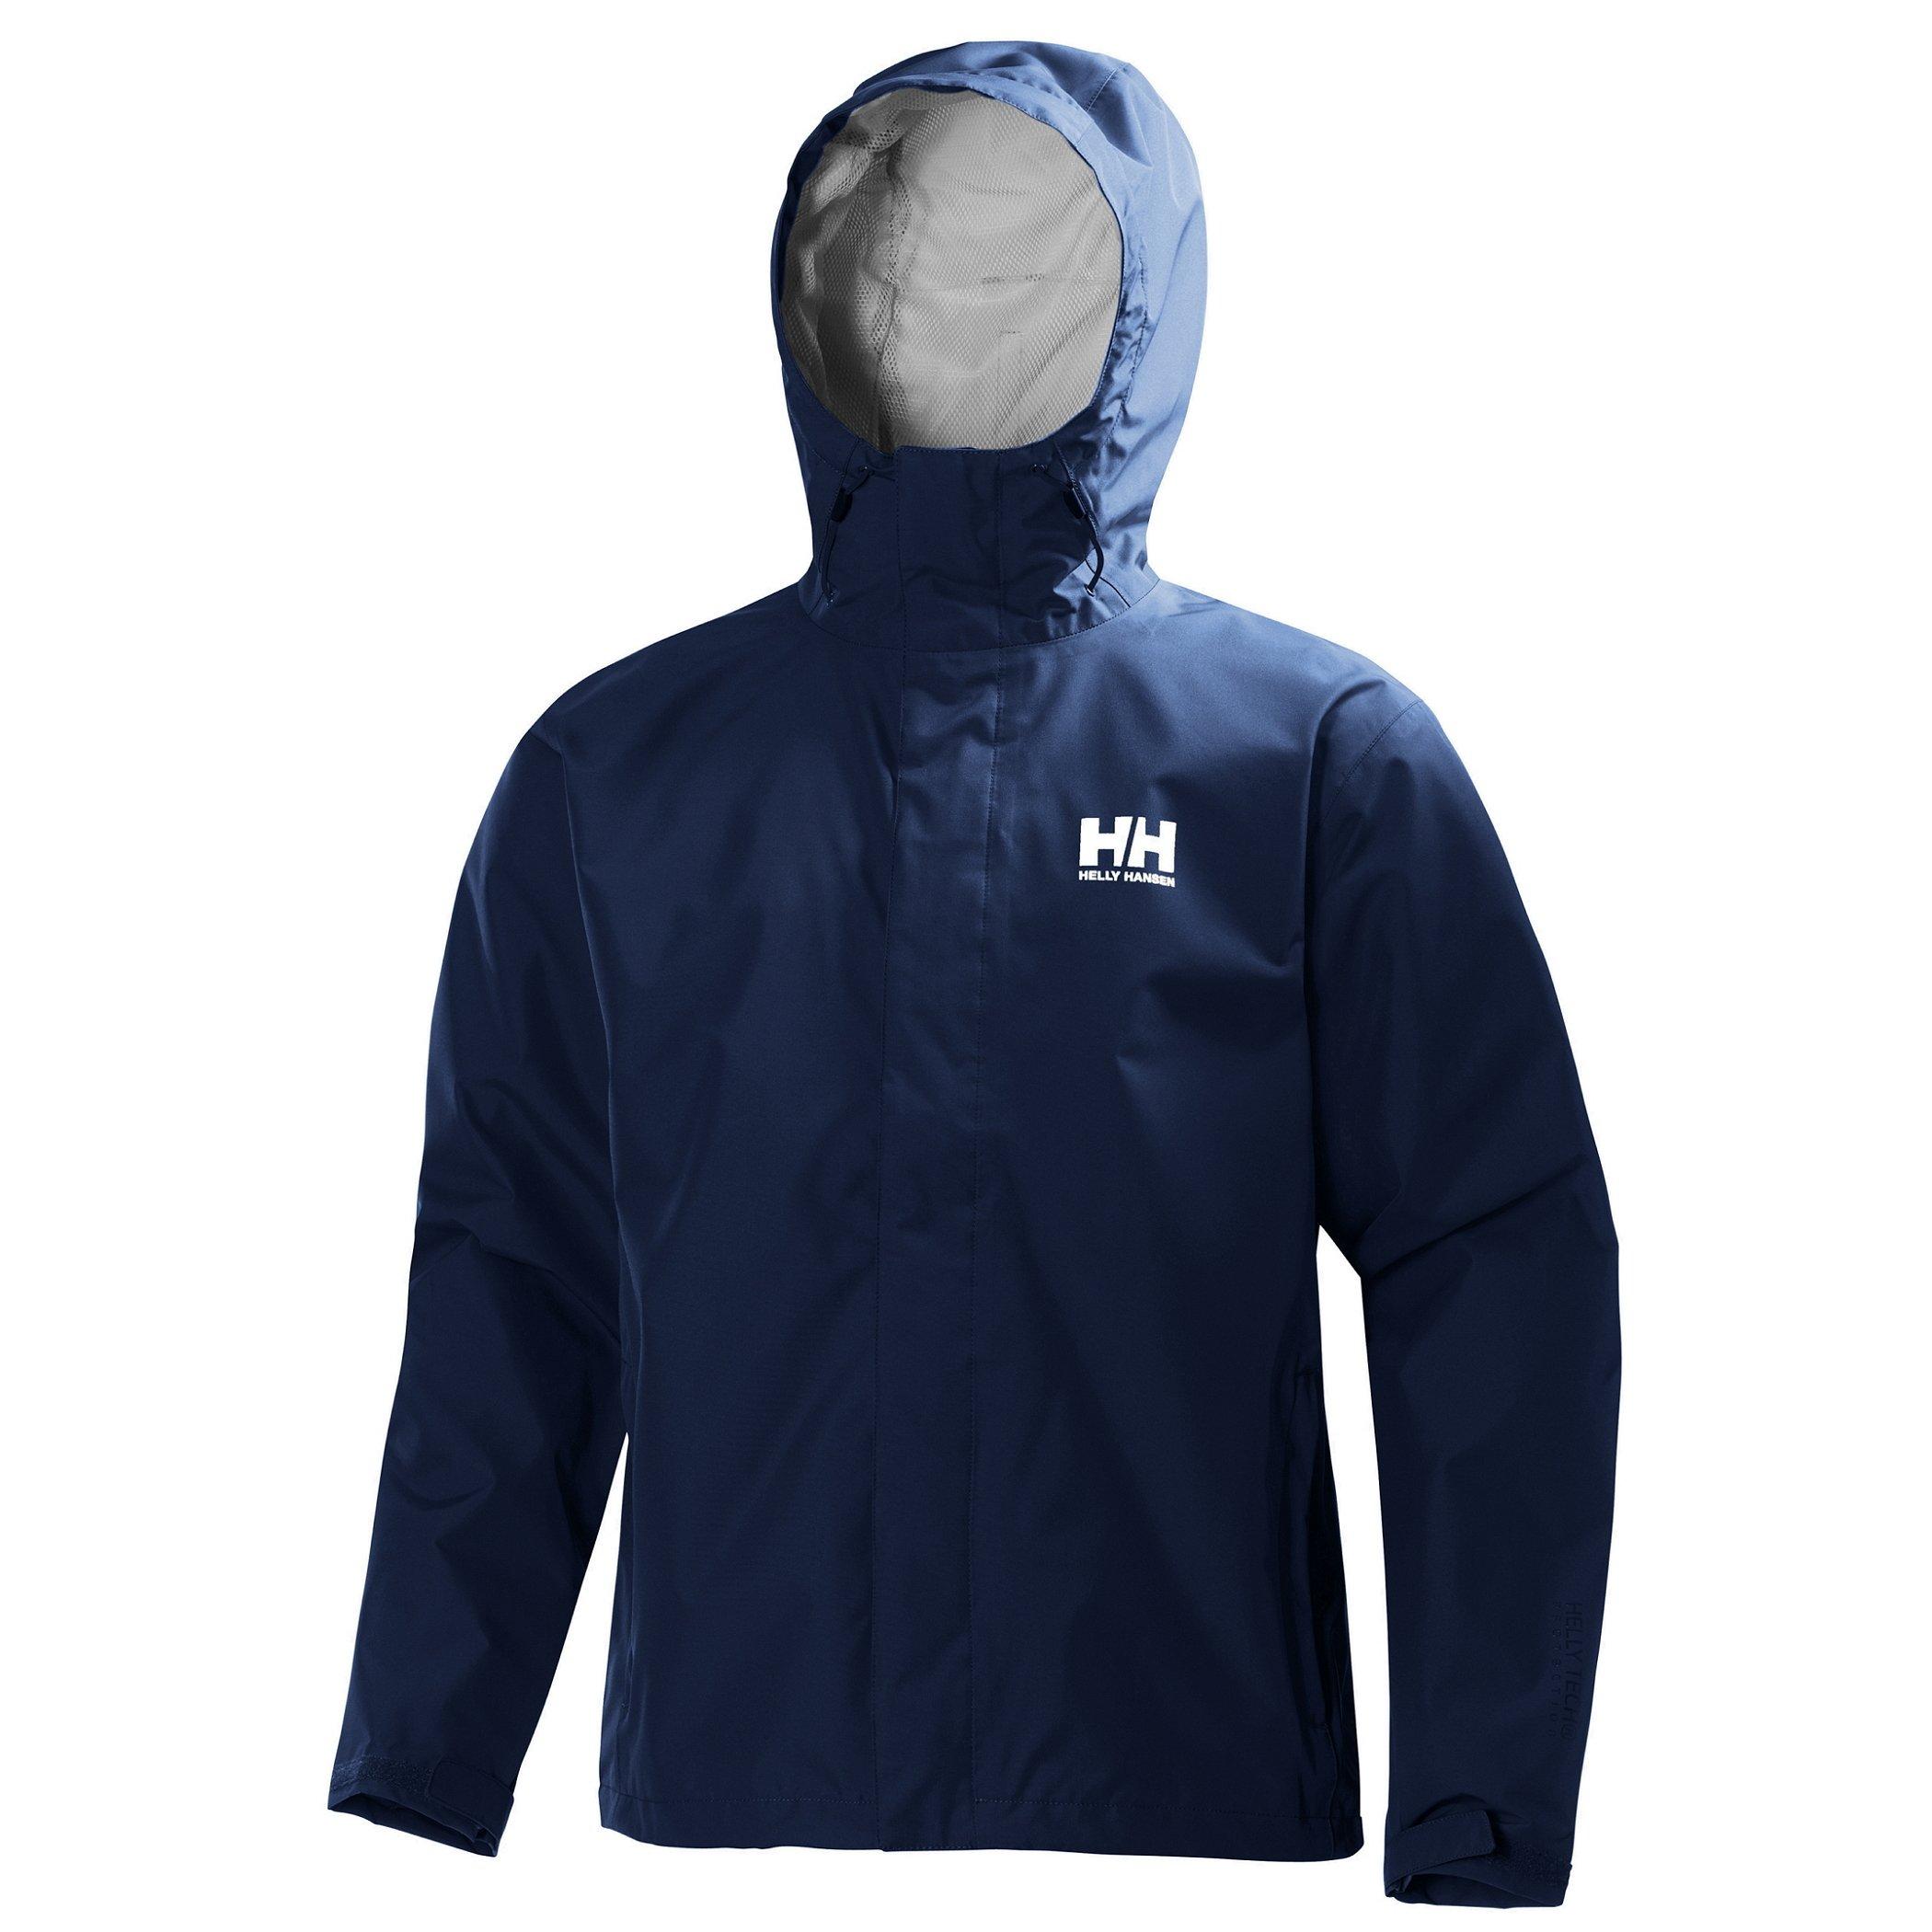 Helly Hansen Men's Seven J Waterproof Windproof Breathable Rain Coat Jacket, 596 Navy, Large